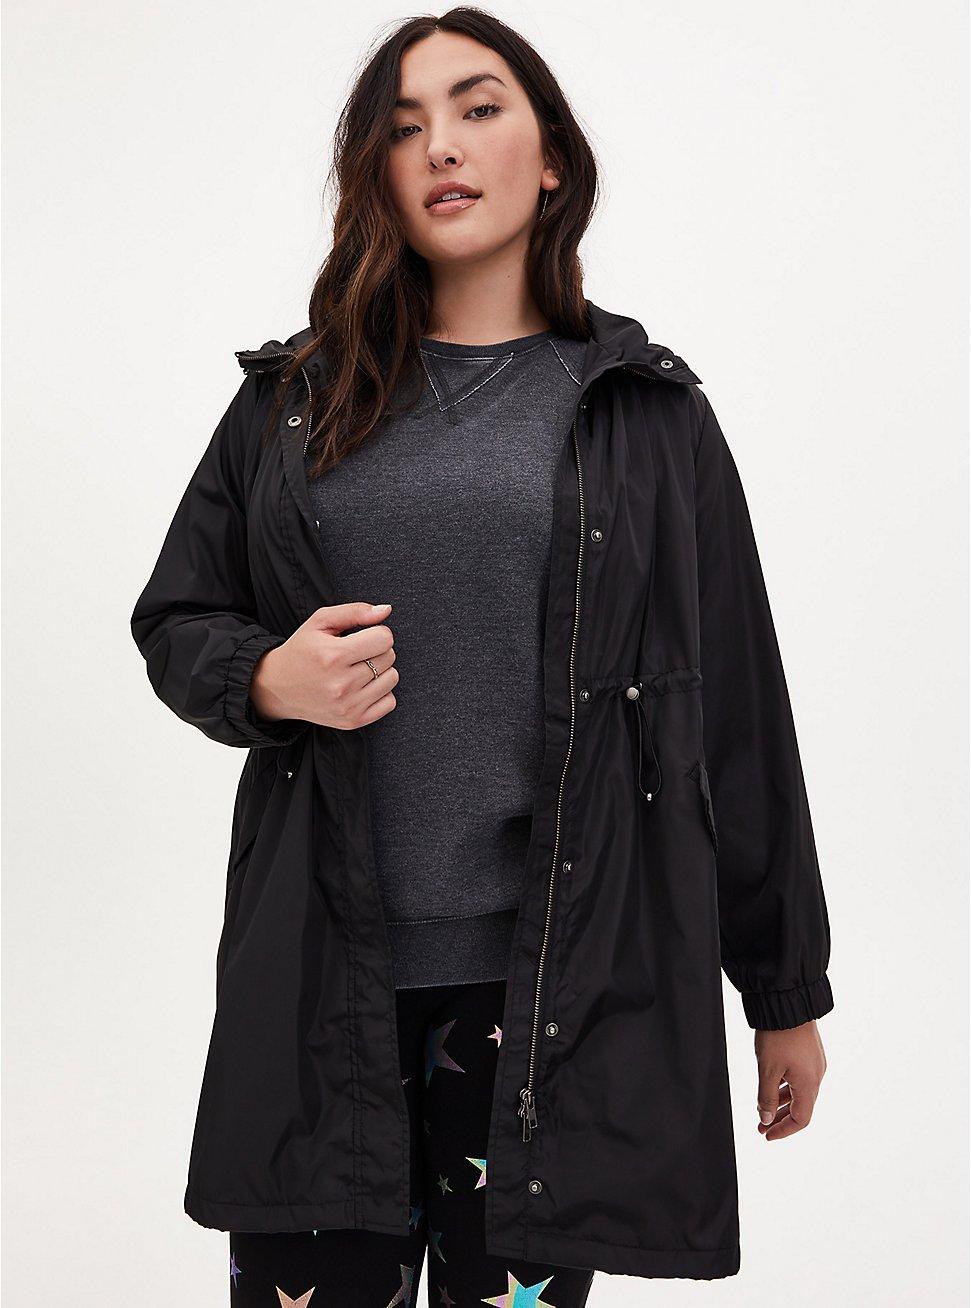 Black Nylon Hooded Longline Rain Jacket, DEEP BLACK, hi-res